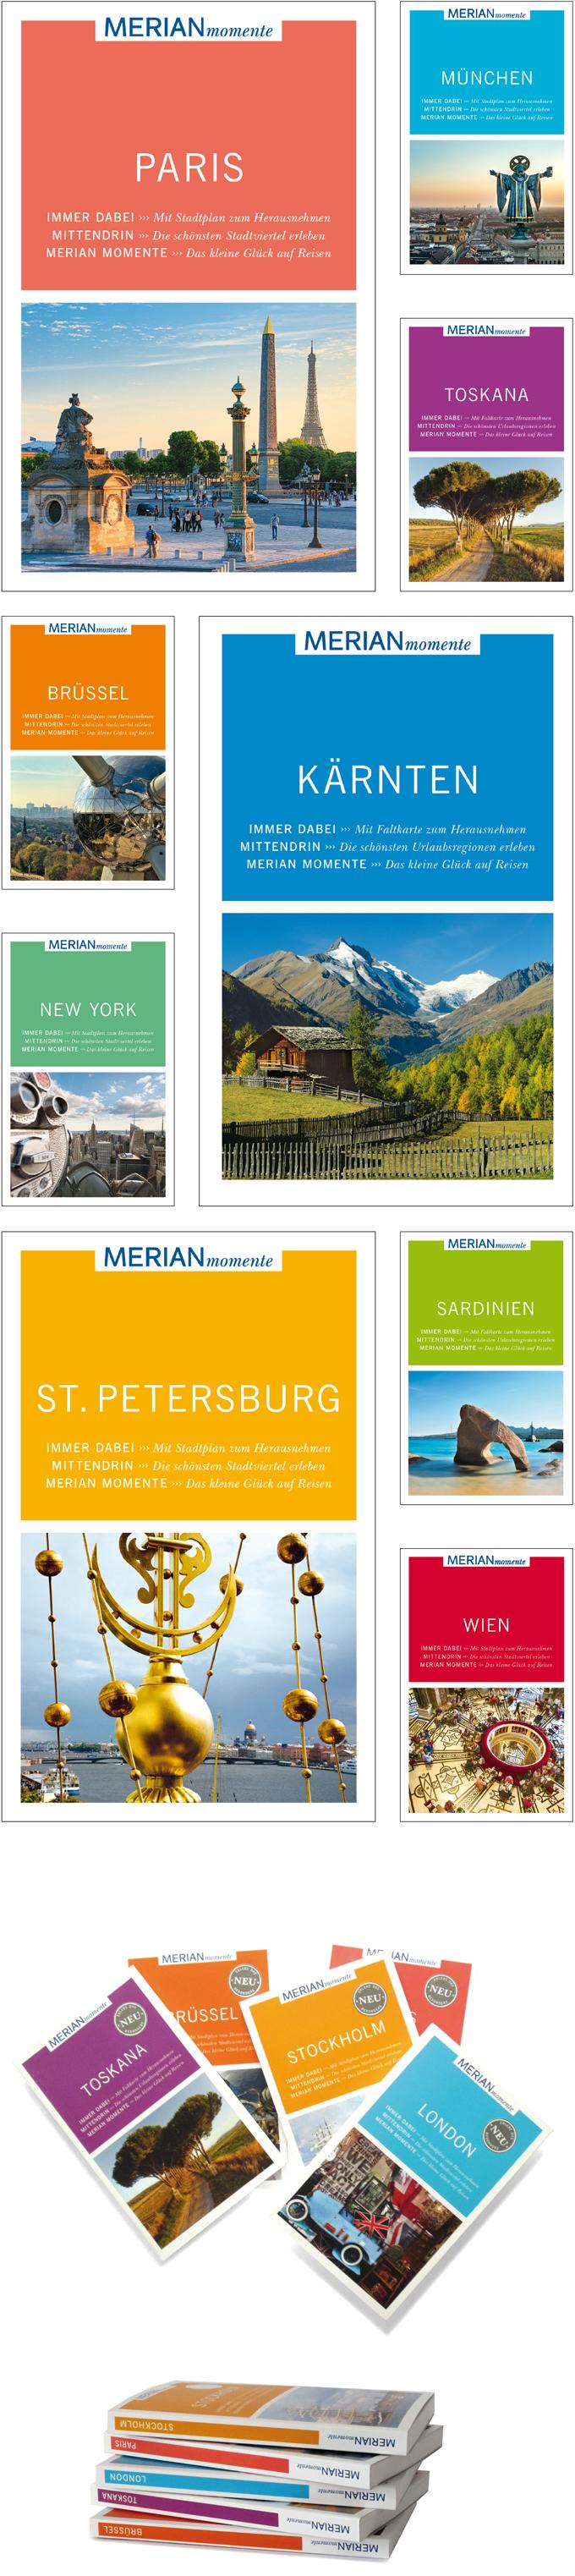 merian_lavoila_cover1